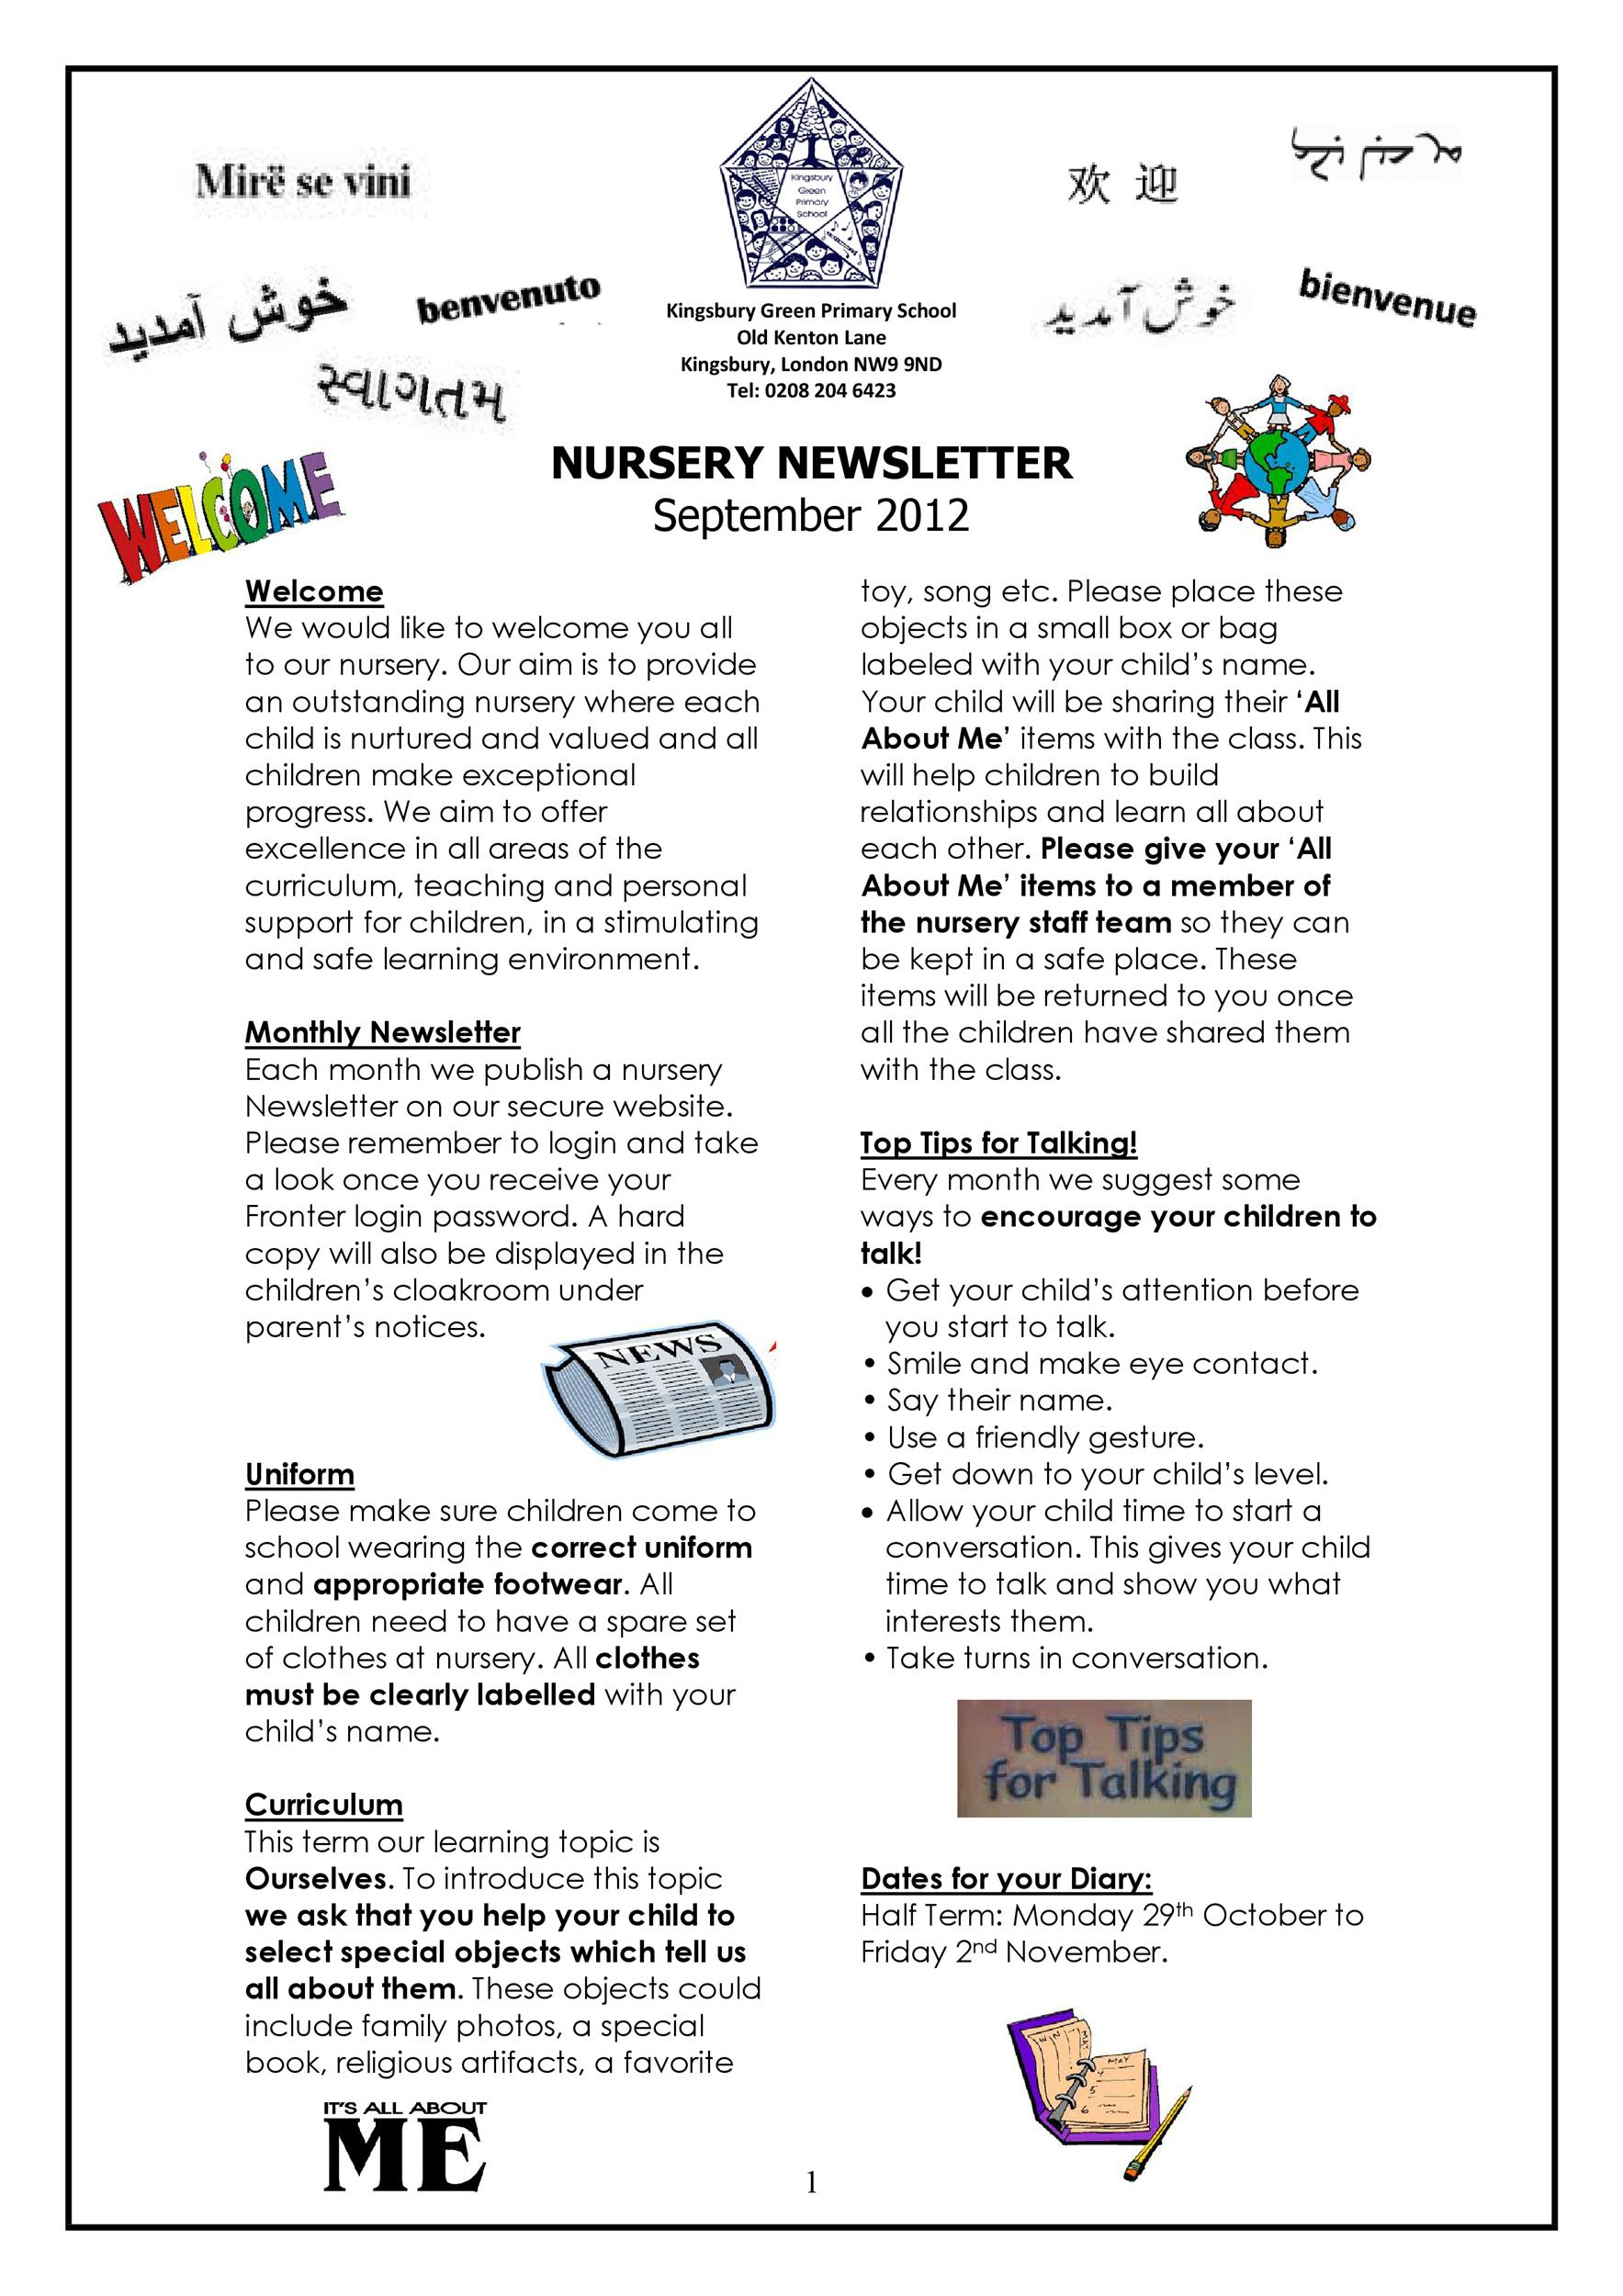 50 Creative Preschool Newsletter Templates Tips Á… Templatelab